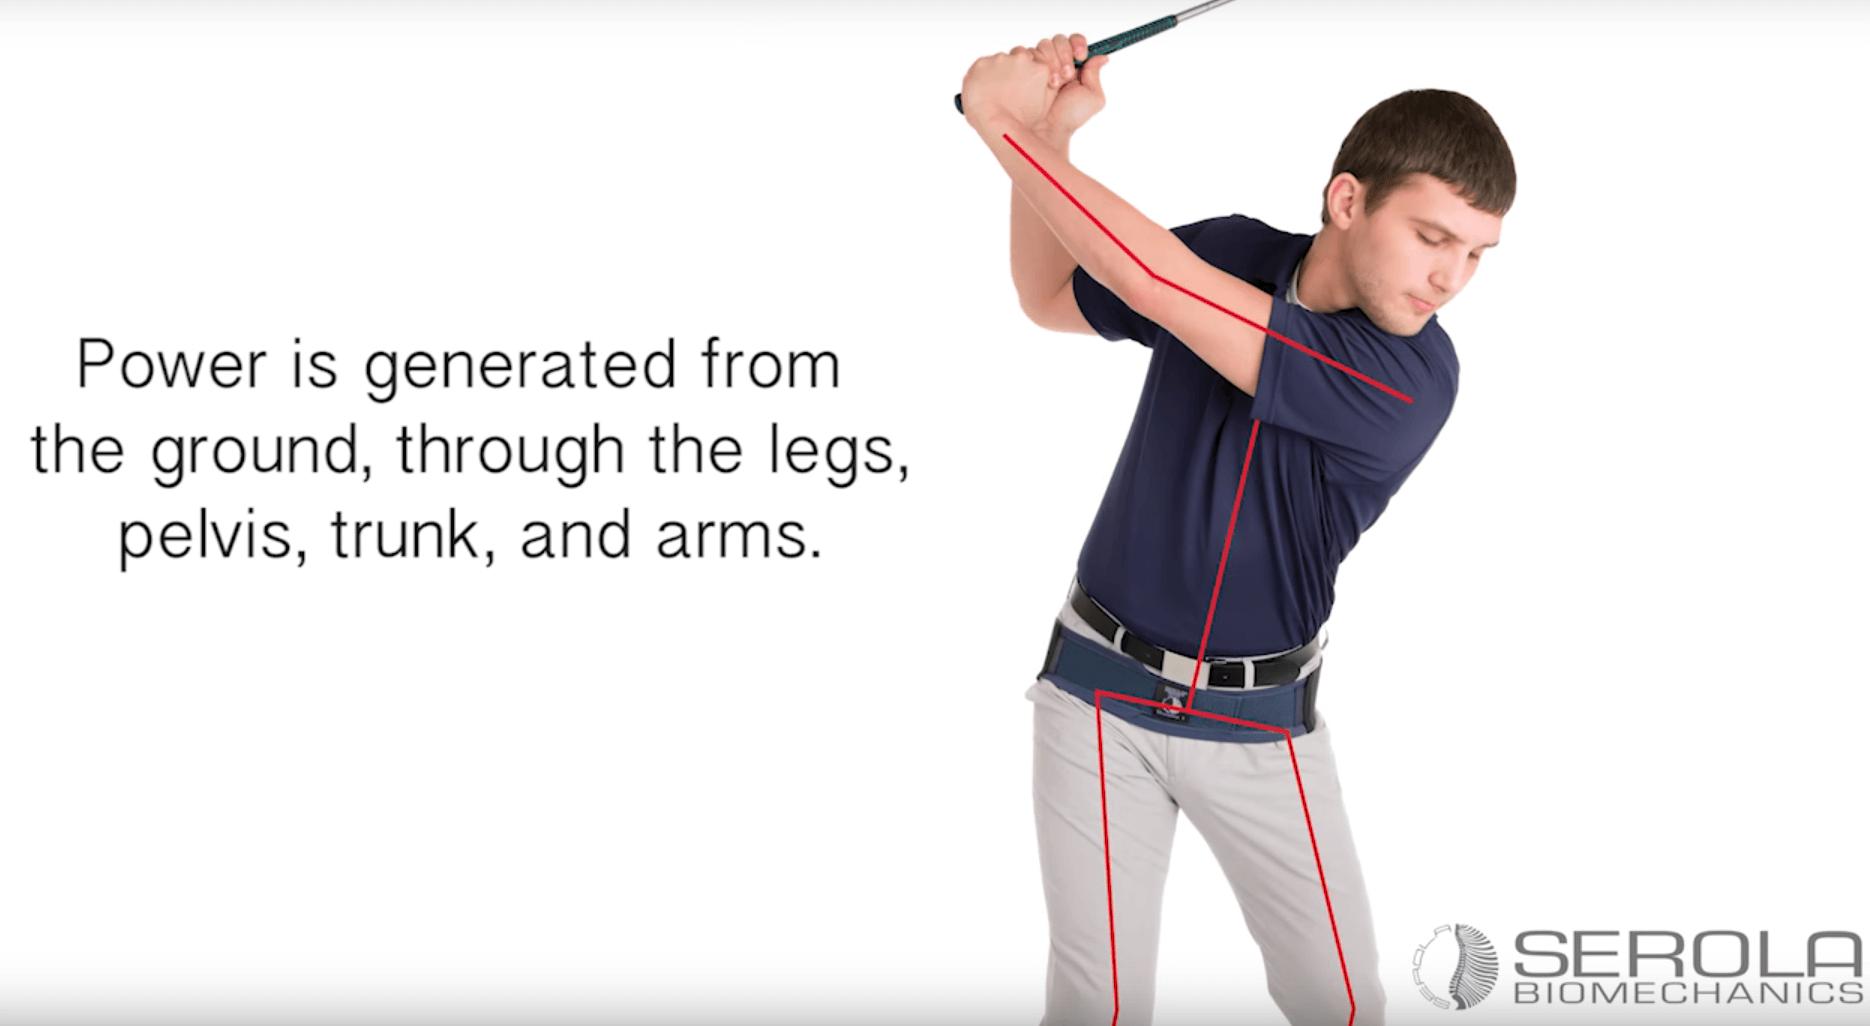 Golf Swing - Serola Belt